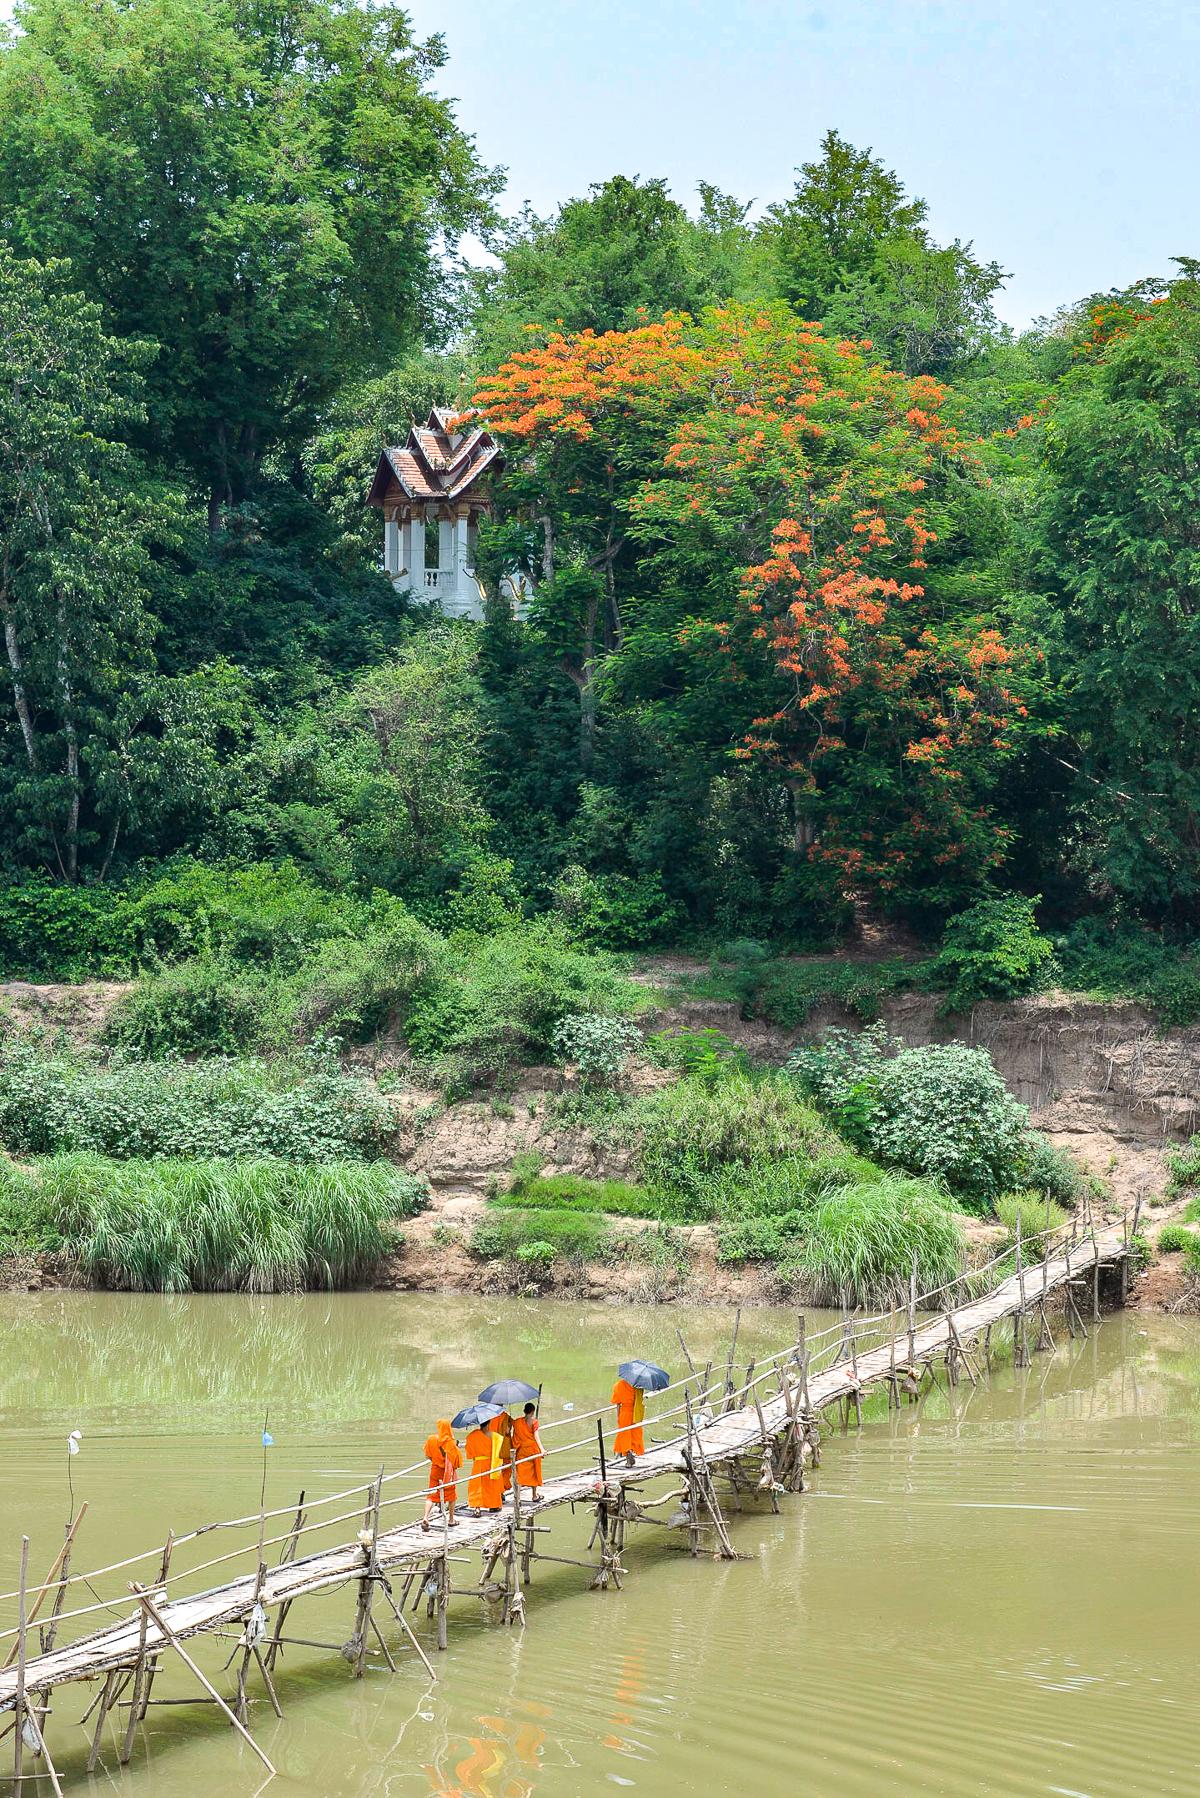 Stacie Flinner 3 Nagas Complete Guide to Luang Prabang-137.jpg